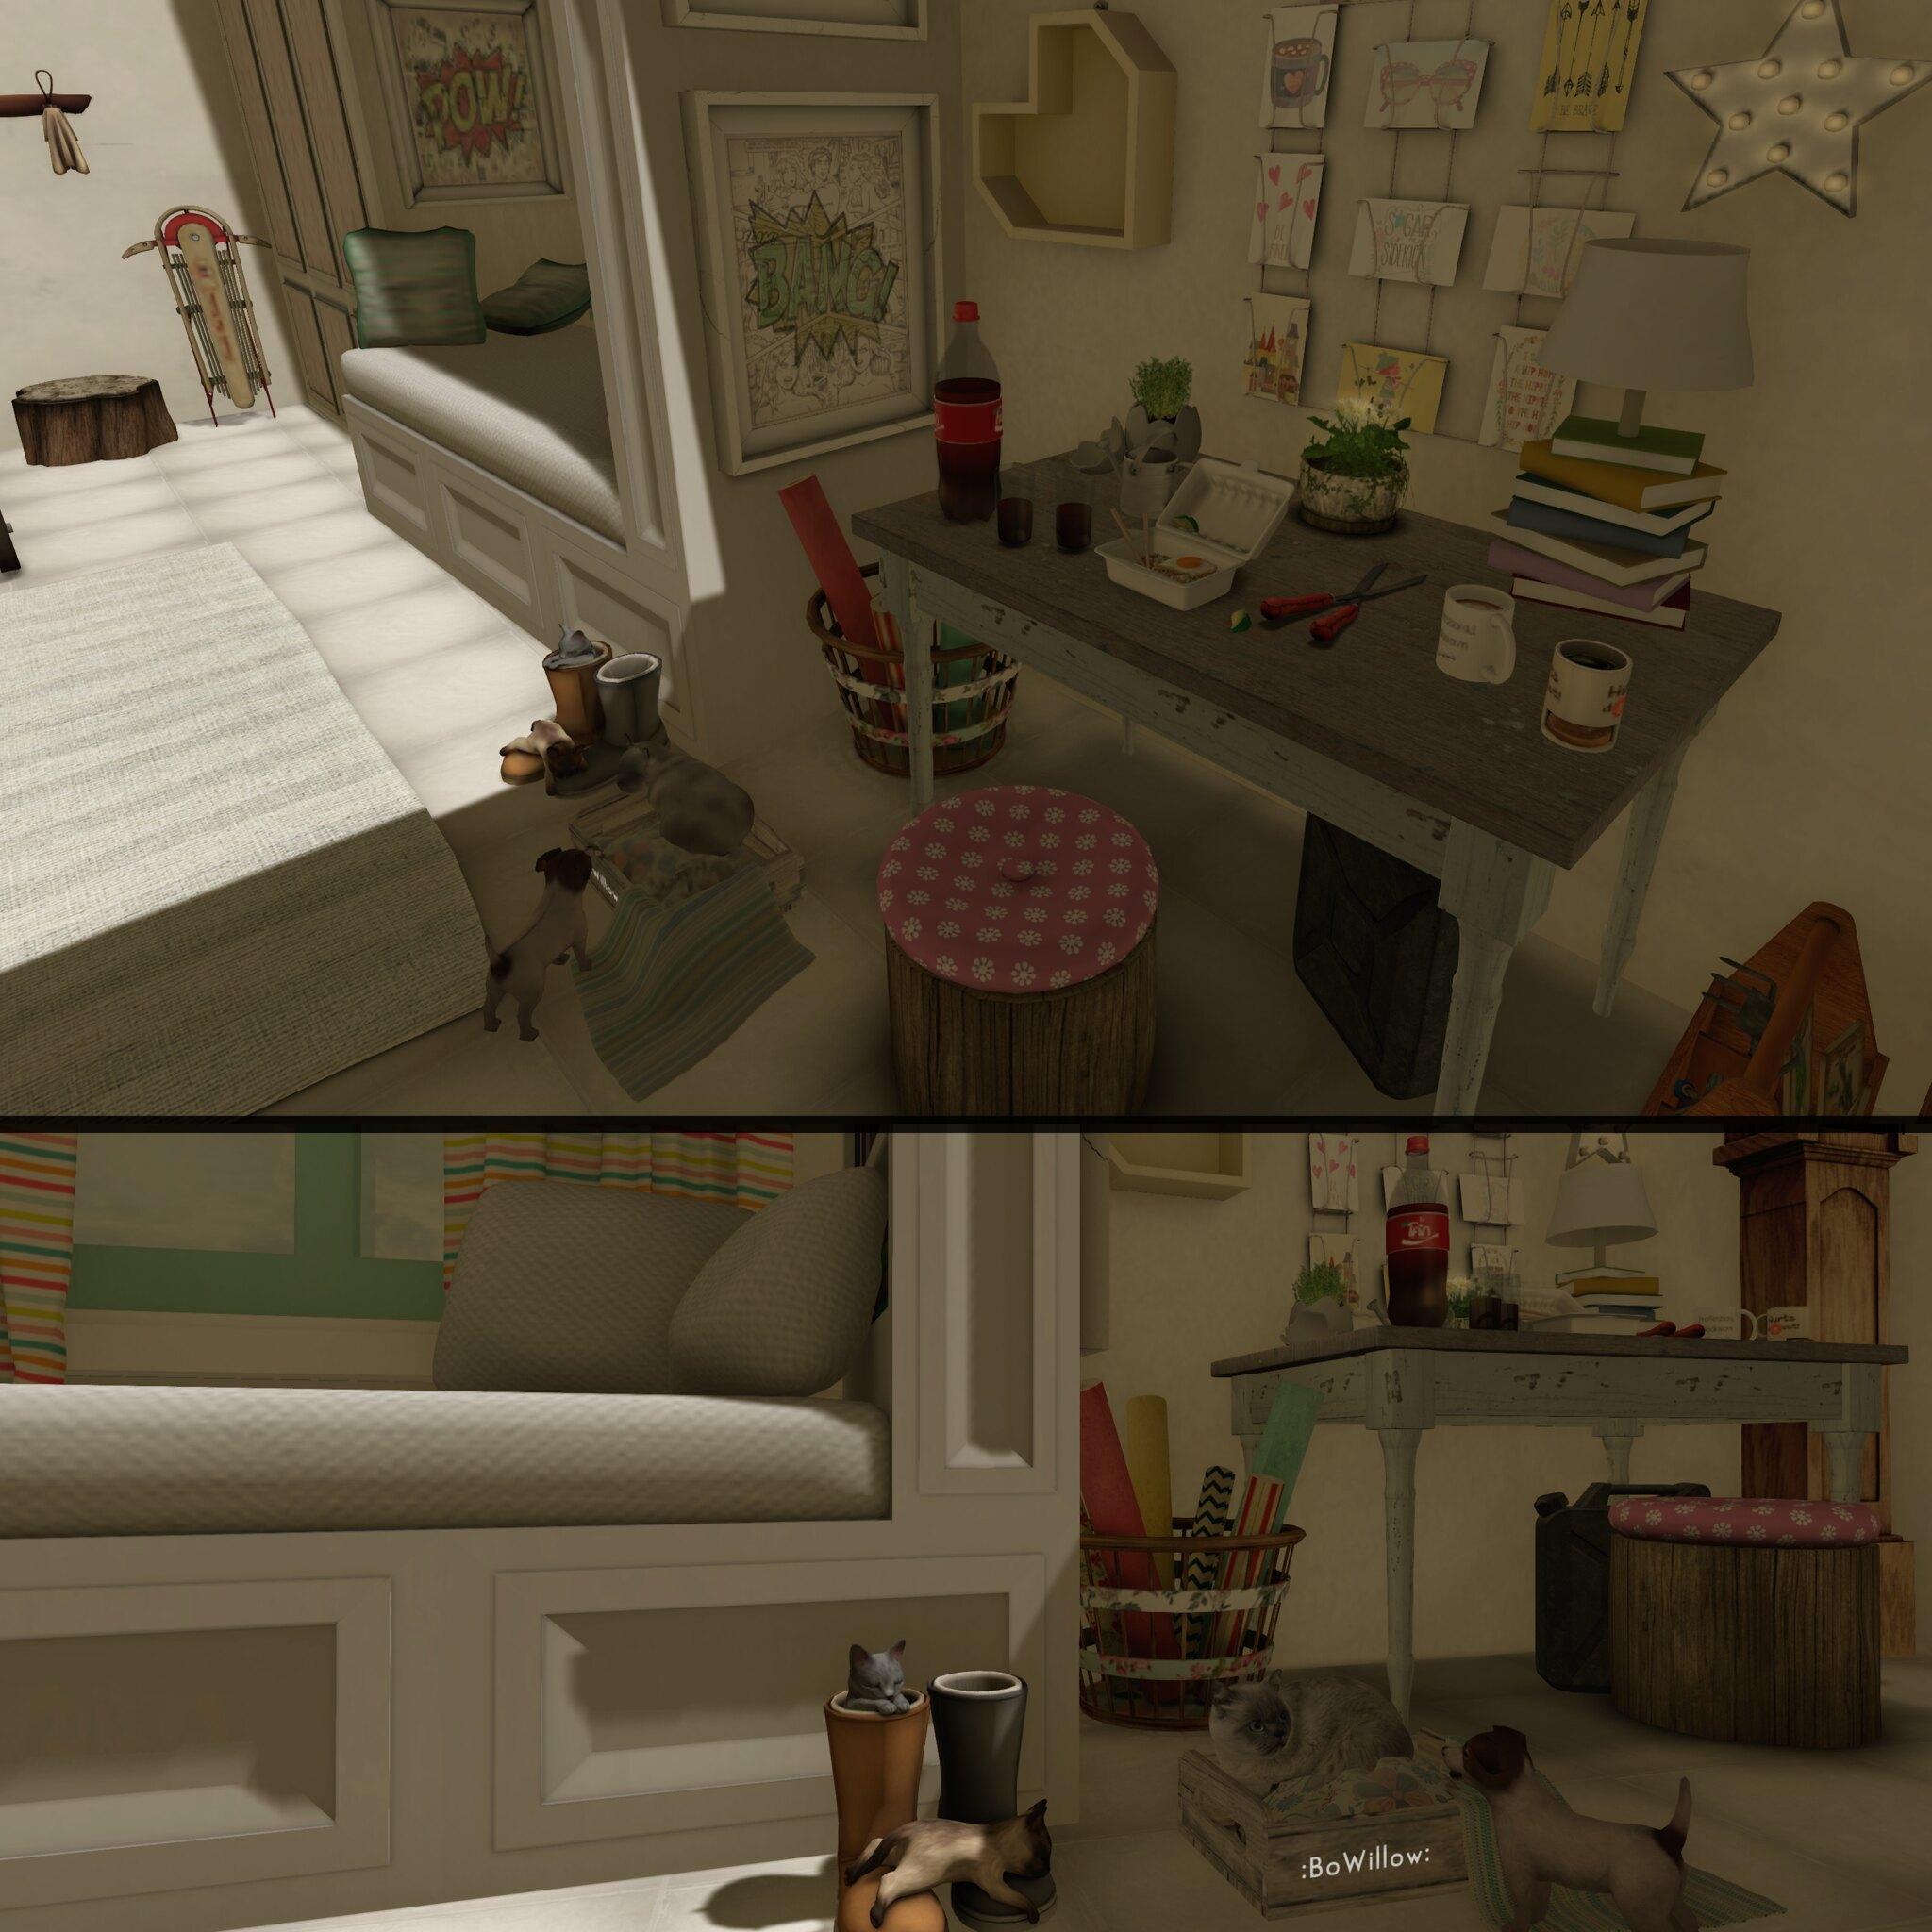 My room 4